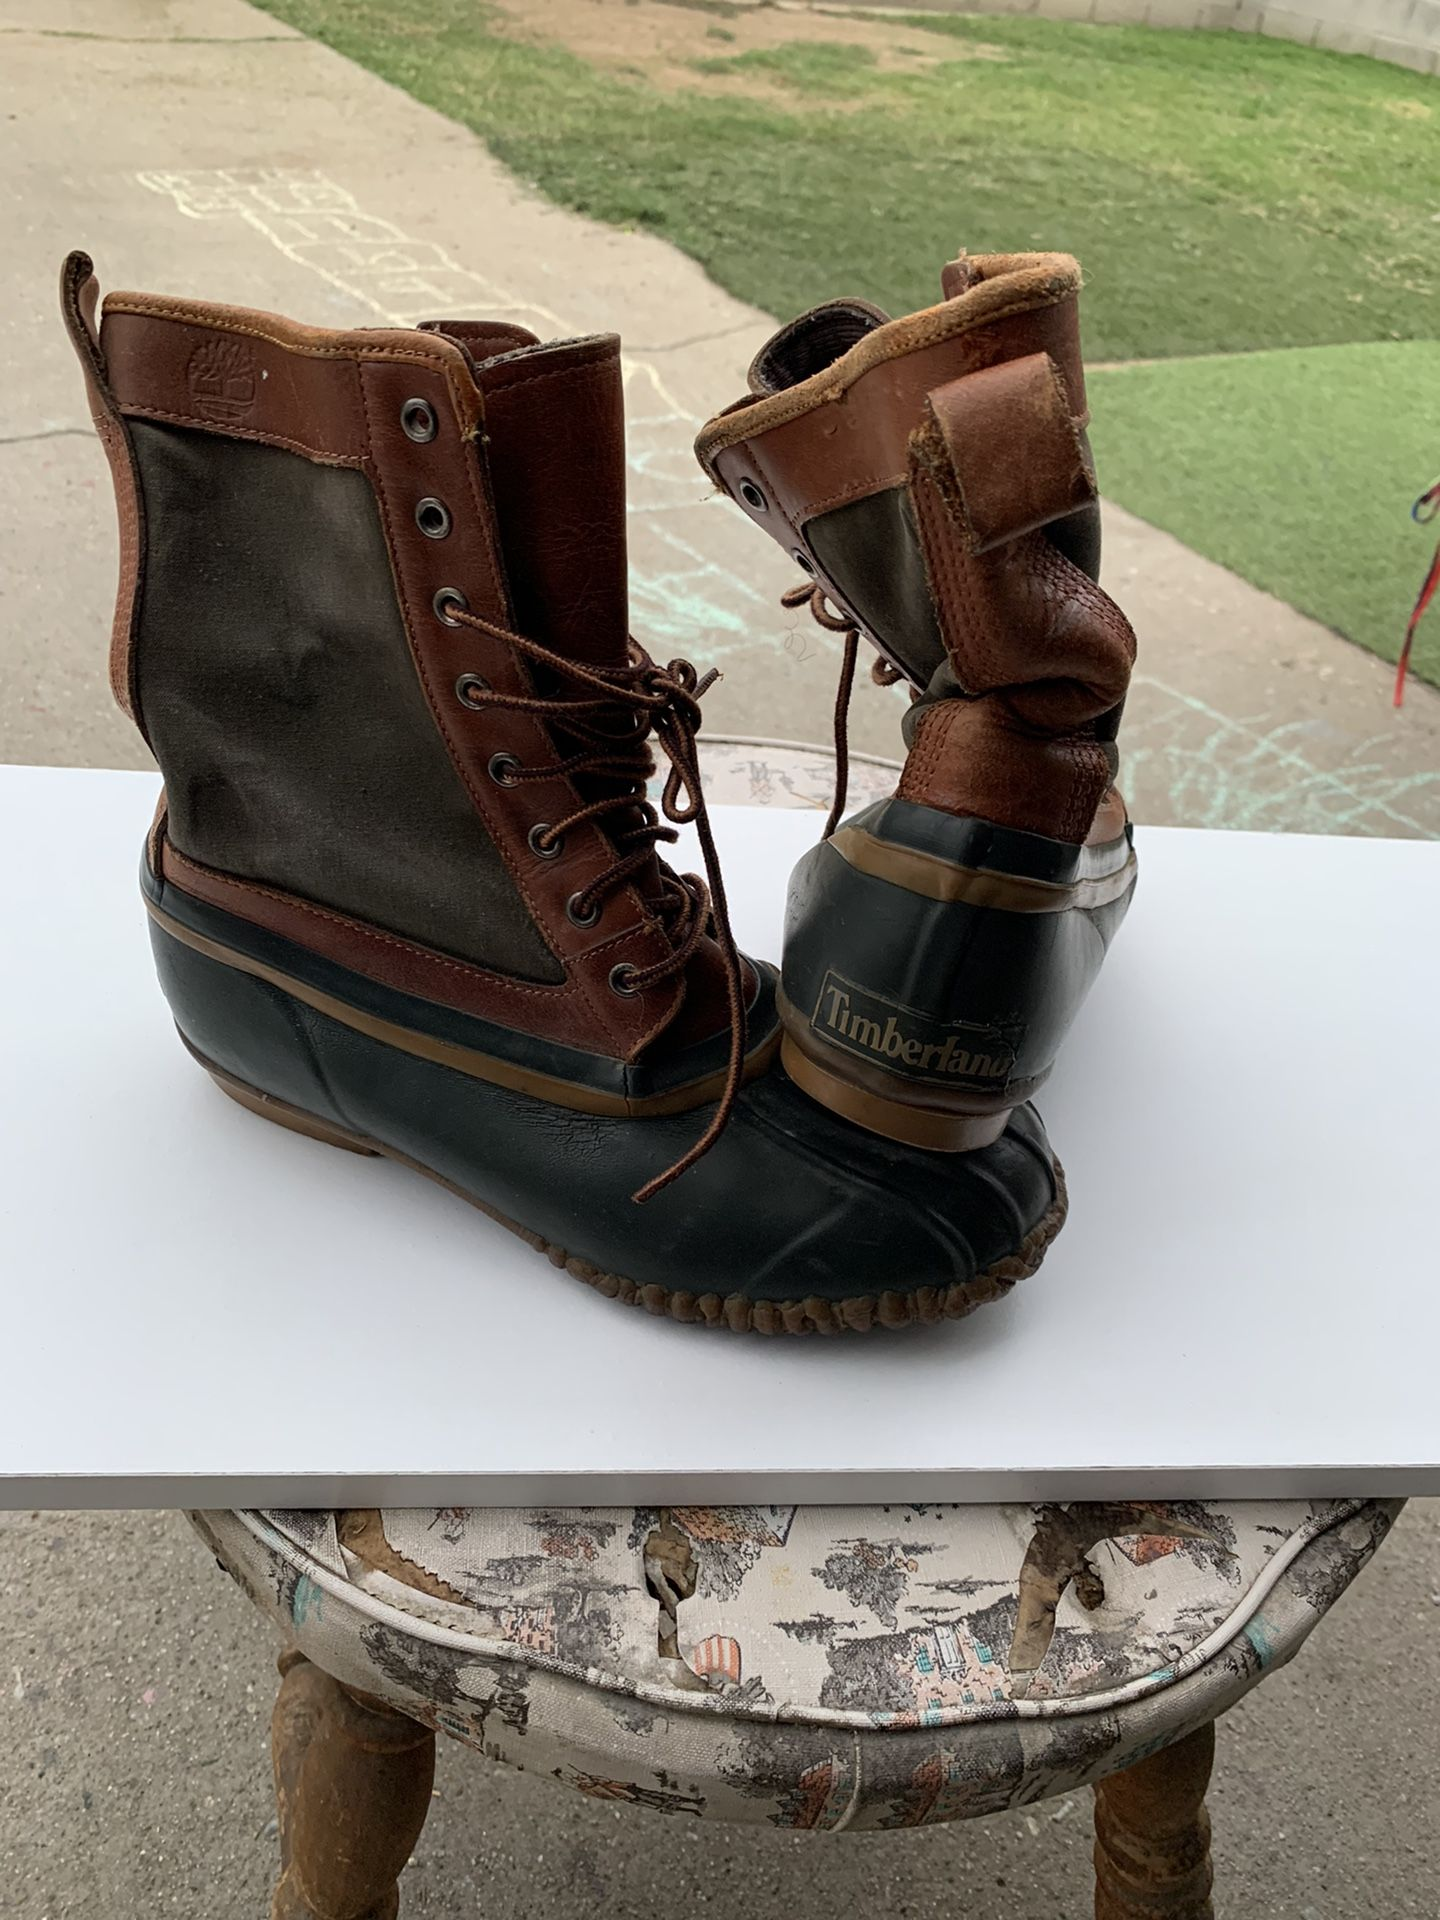 Timberland Old School Rain Boots